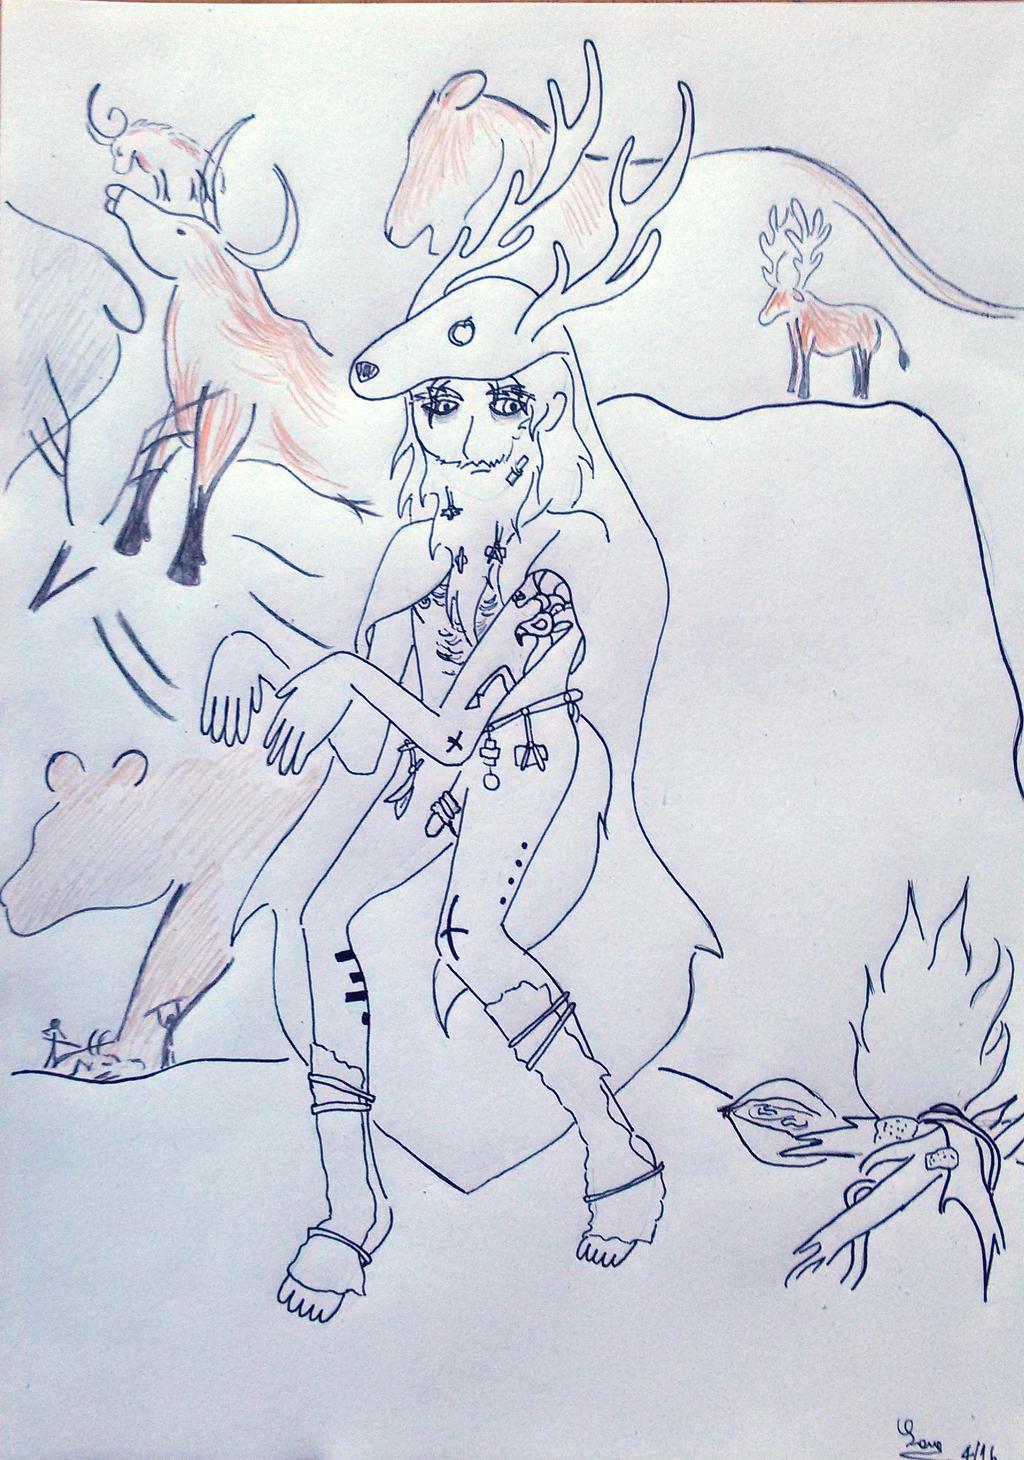 Sorcerer by saramarconato